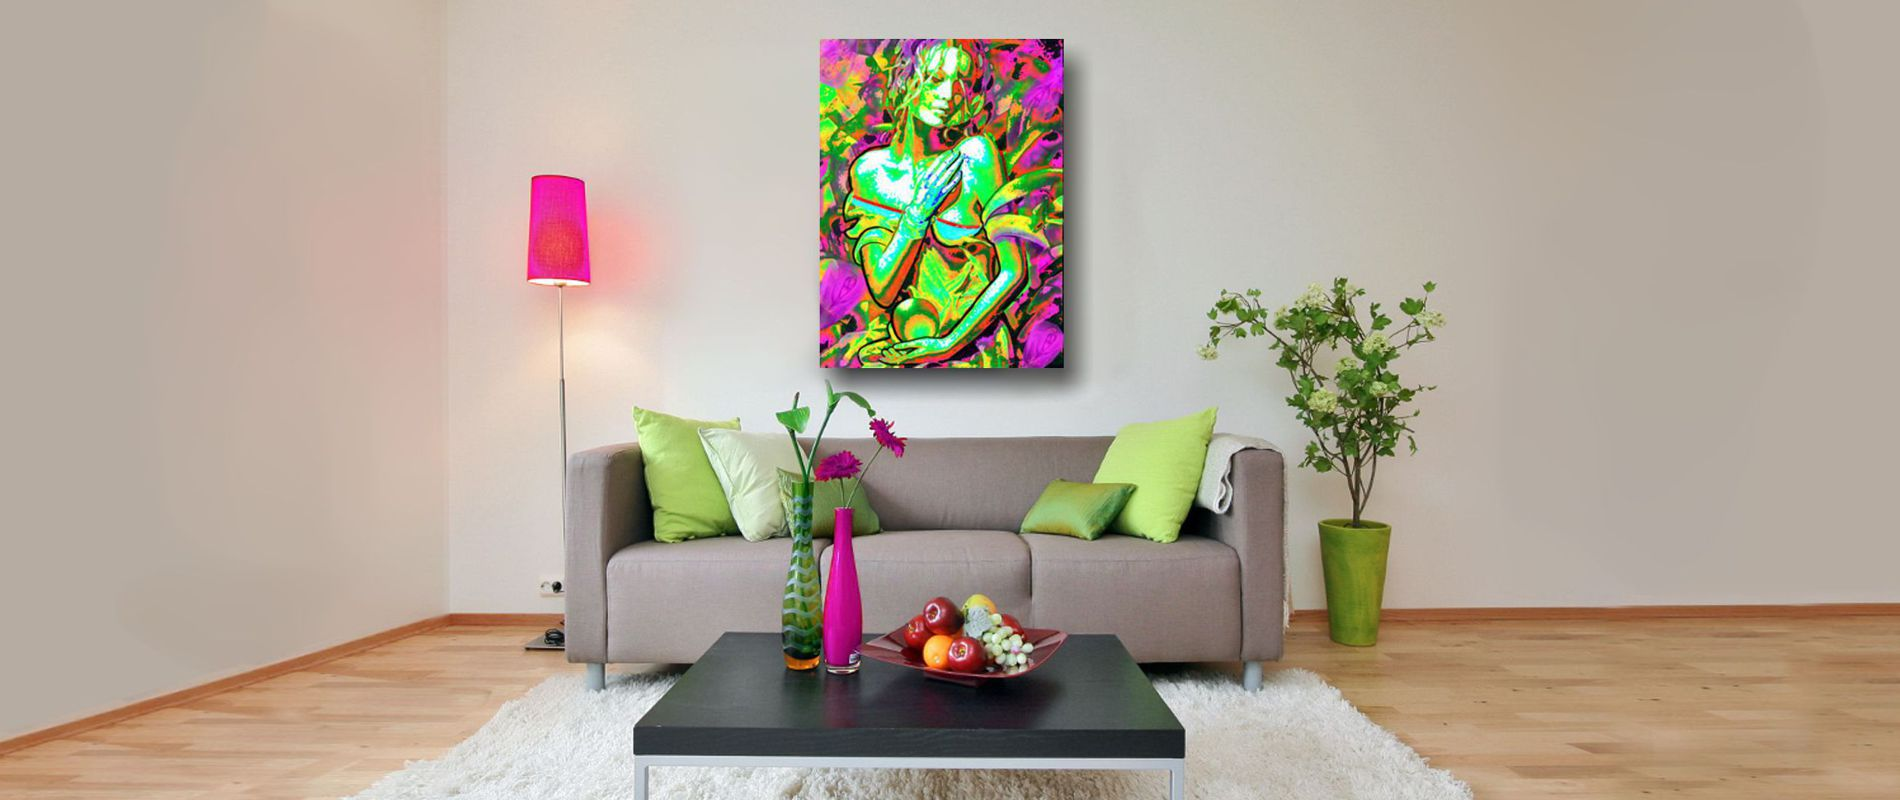 artworks paintings vincenzo greco new york miami (11)